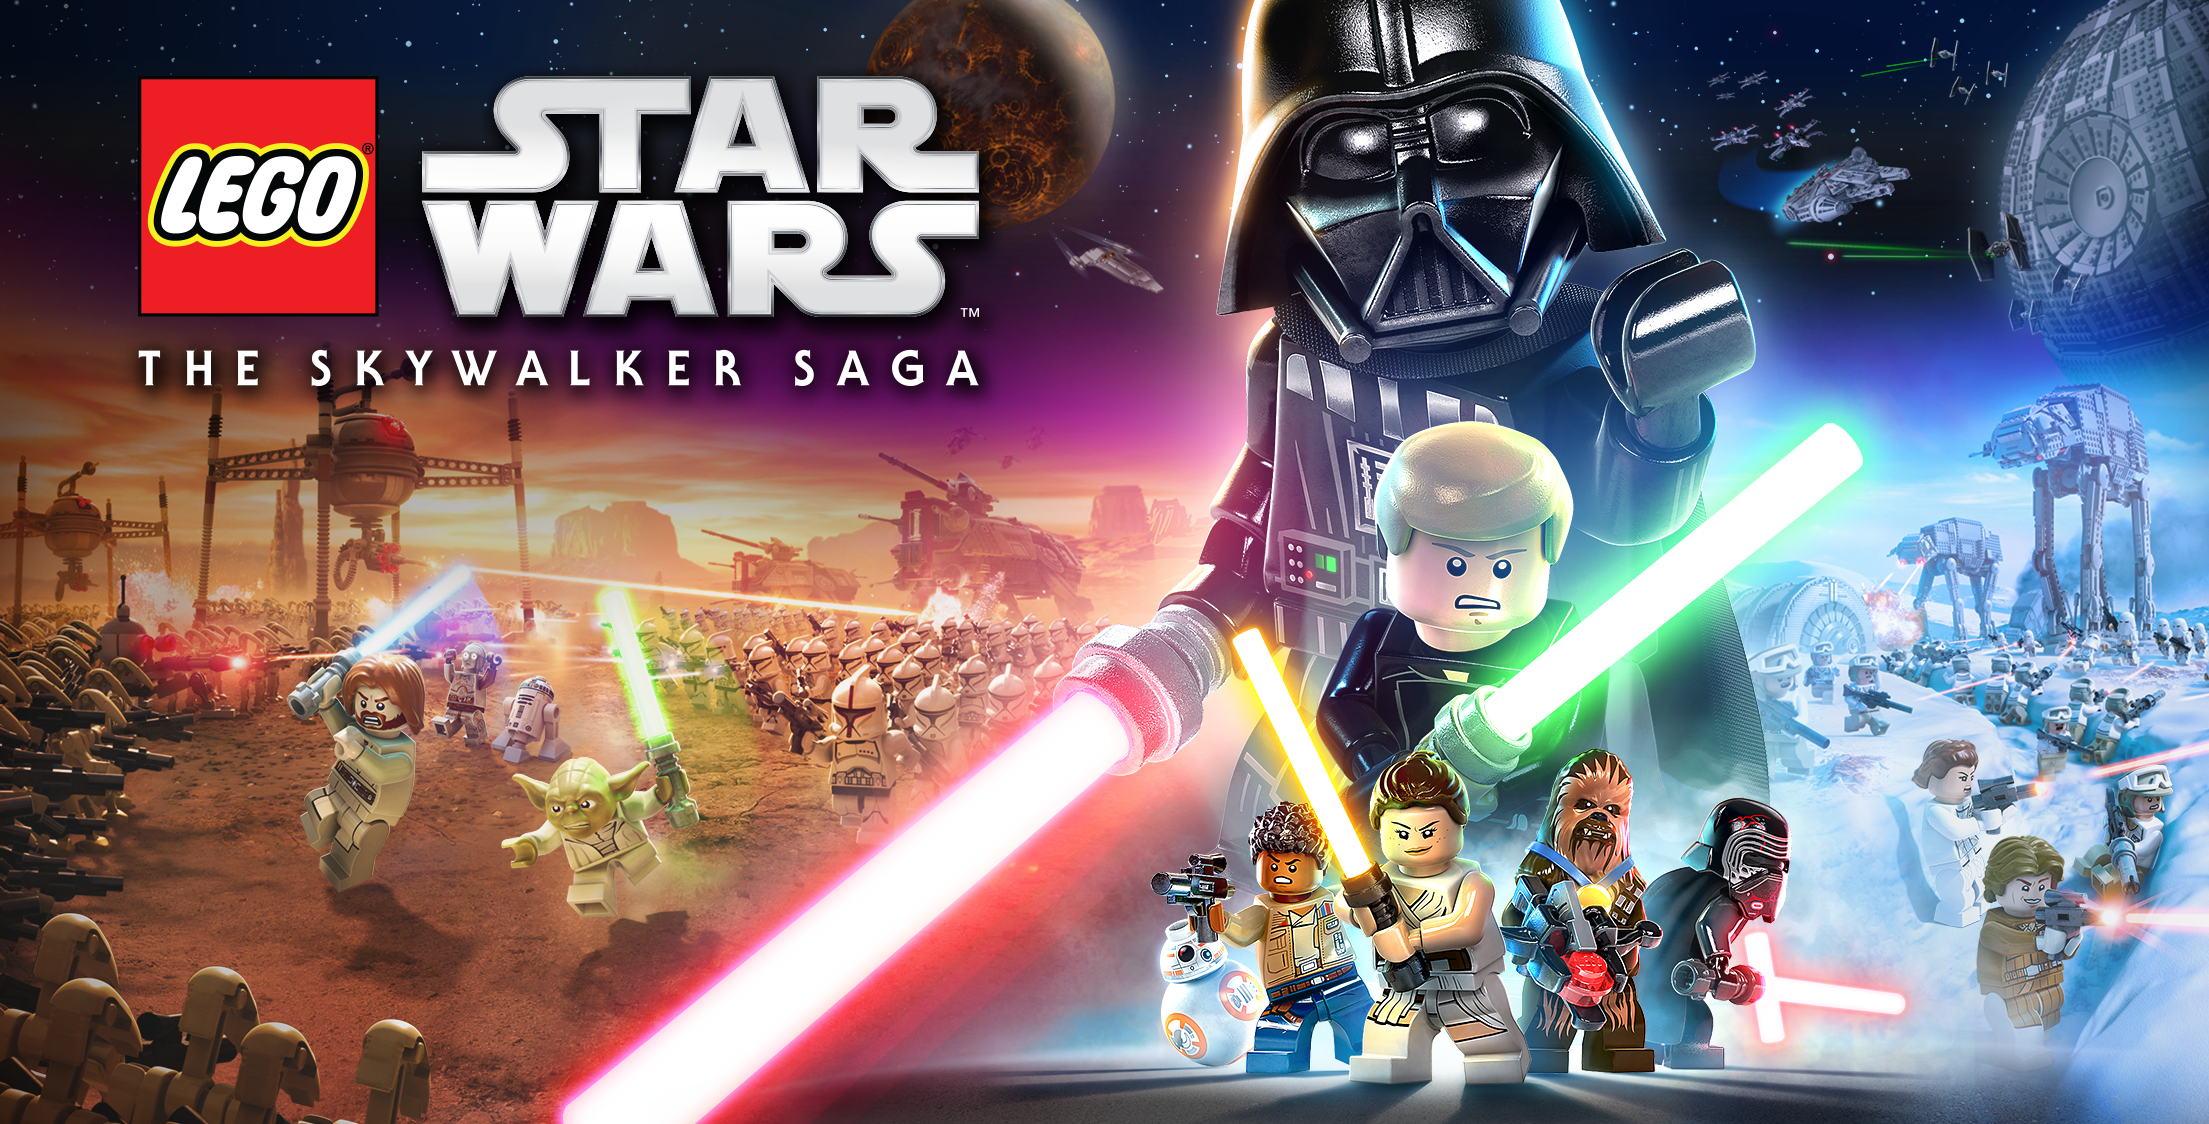 Official key art for LEGO Star Wars: The Skywalker Saga